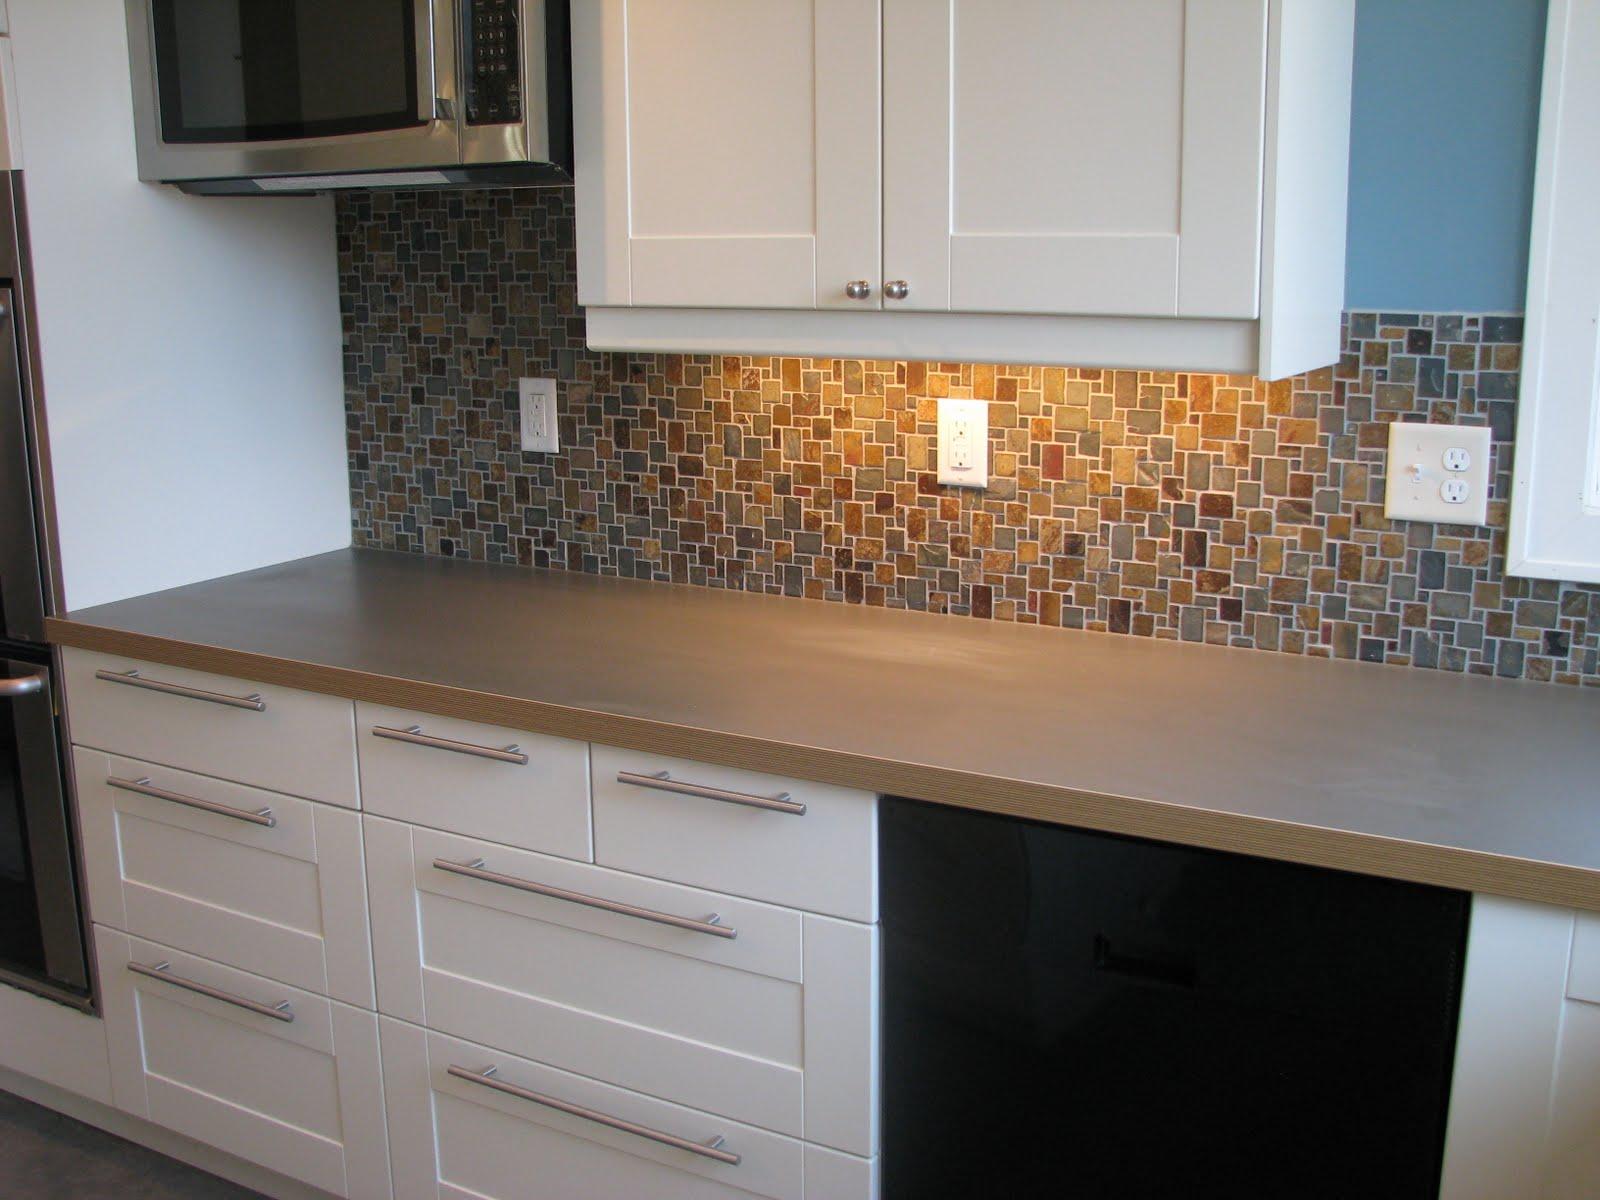 Slate look wallpaper wallpapersafari - Wallpaper that looks like tile for kitchen backsplash ...